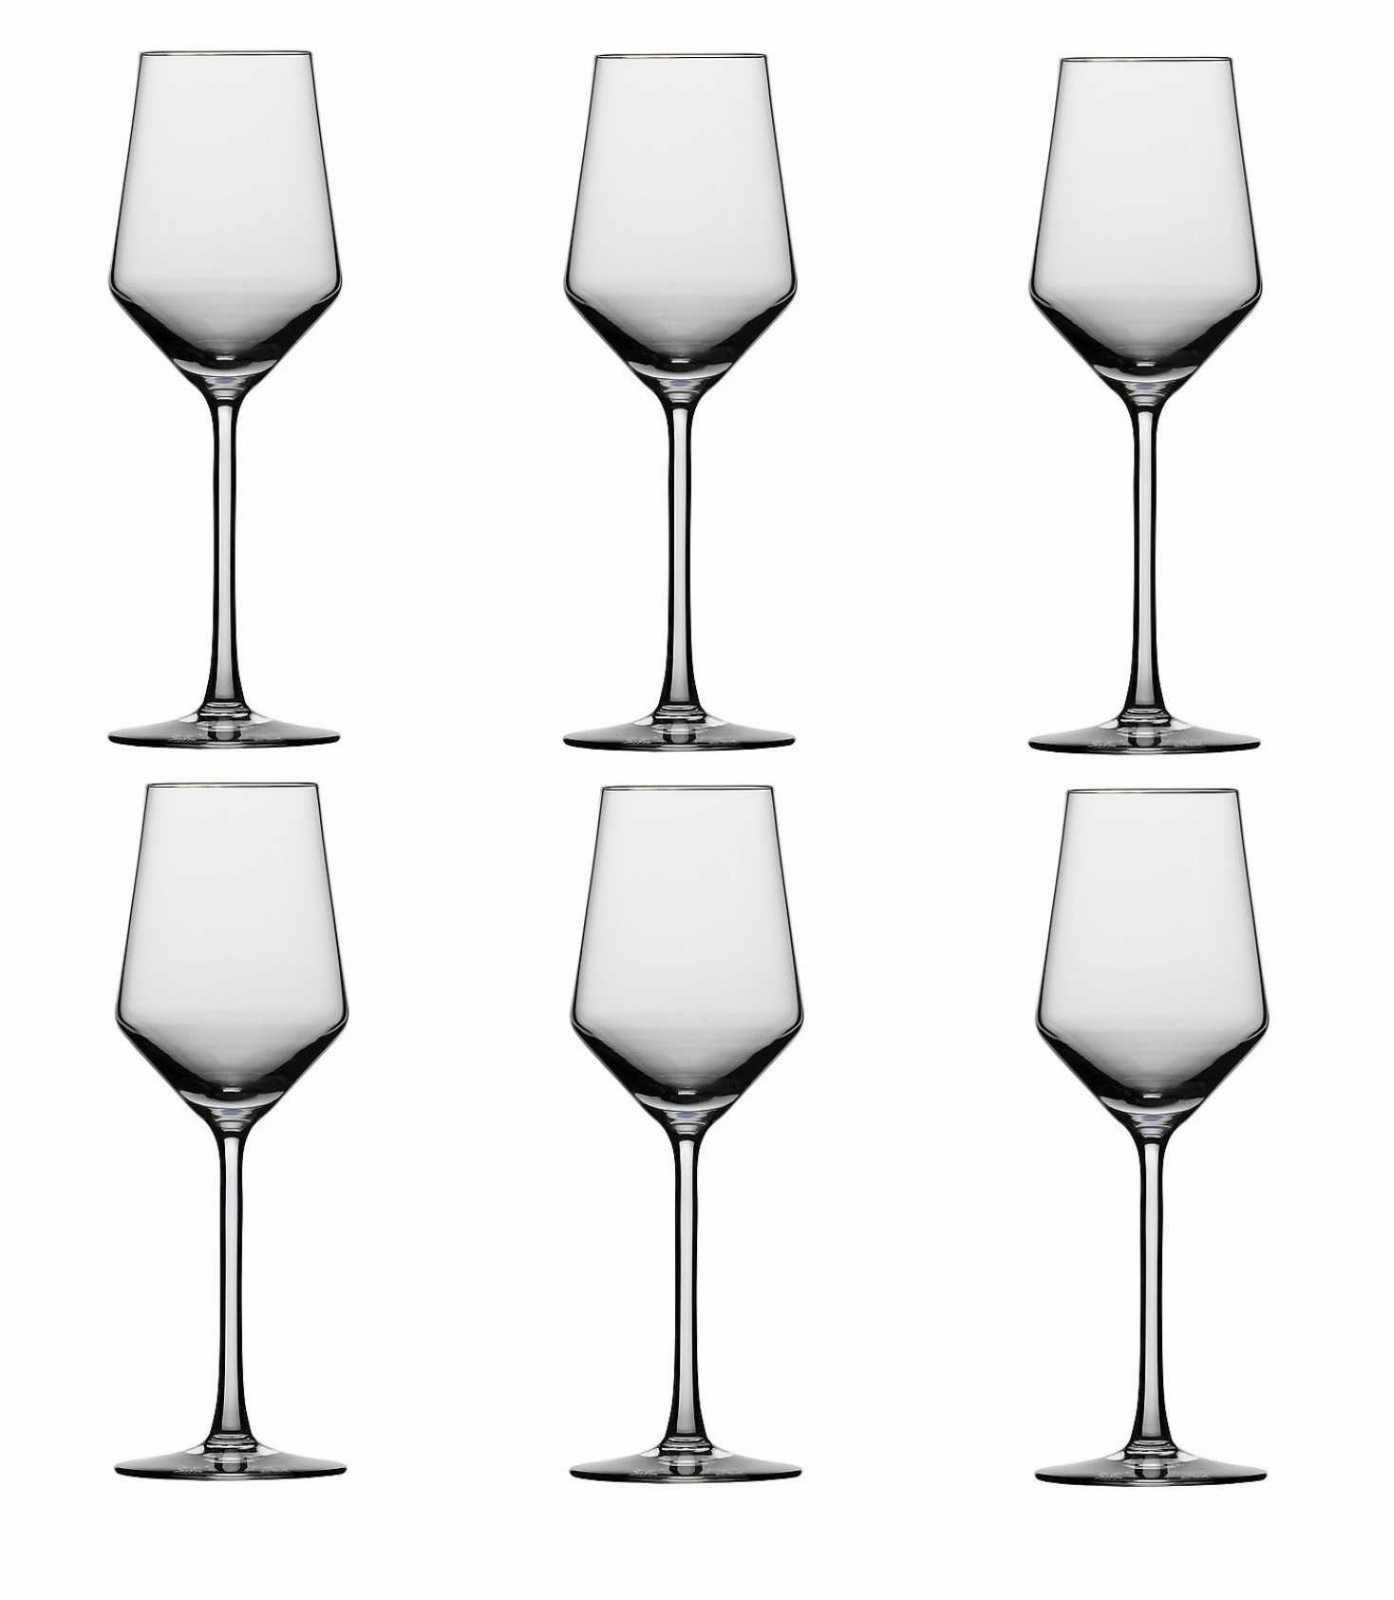 Онлайн каталог PROMENU: Набор бокалов для белого вина Schott Zwiesel PURE, объем 0,3 л, прозрачный, 6 штук Schott Zwiesel 112414_6шт